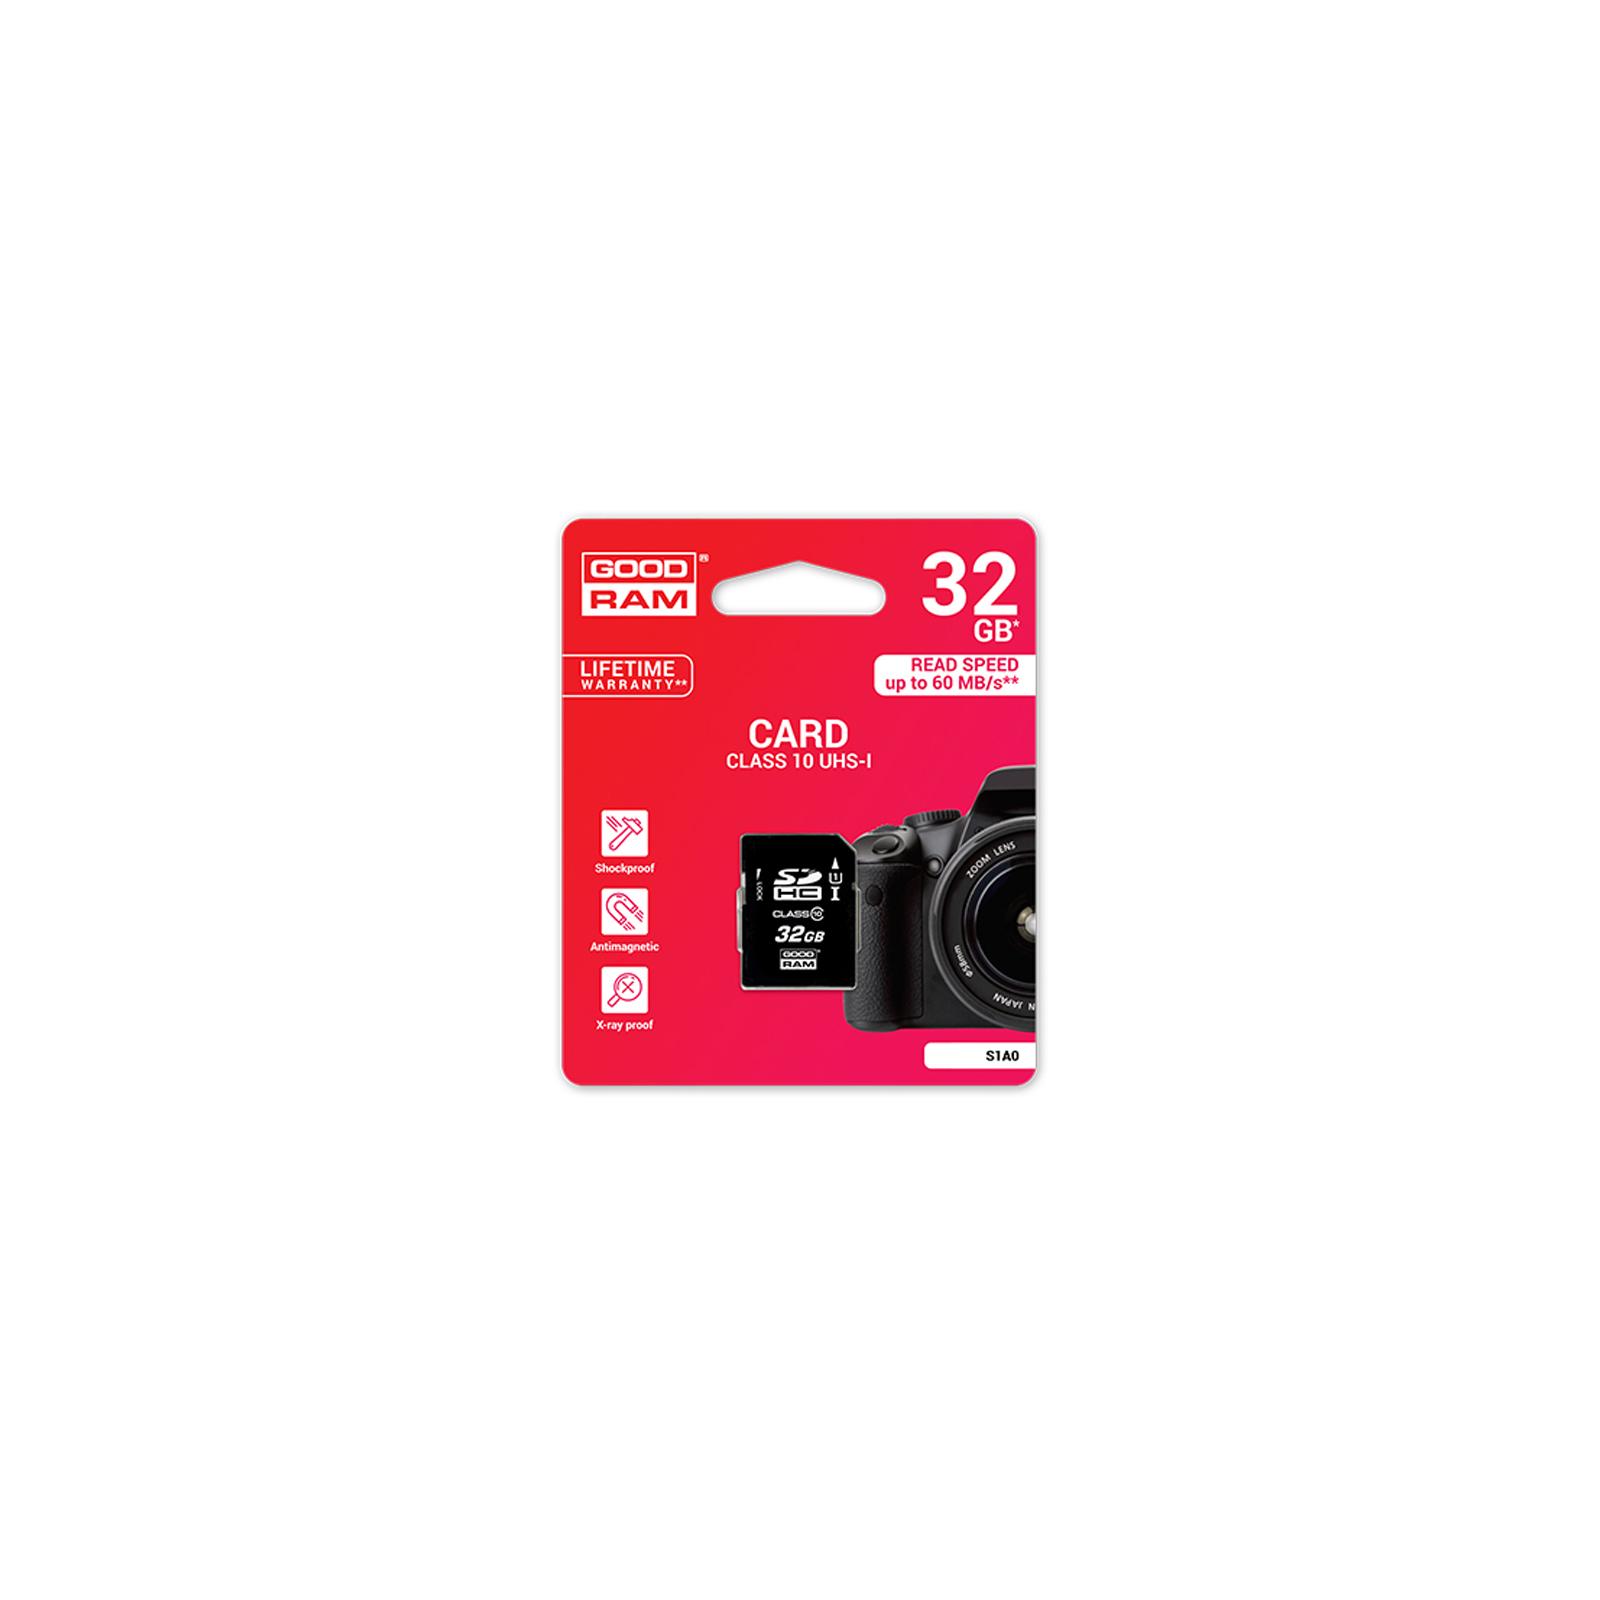 Карта памяти GOODRAM 32GB SDHC (S1A0-0320R11)